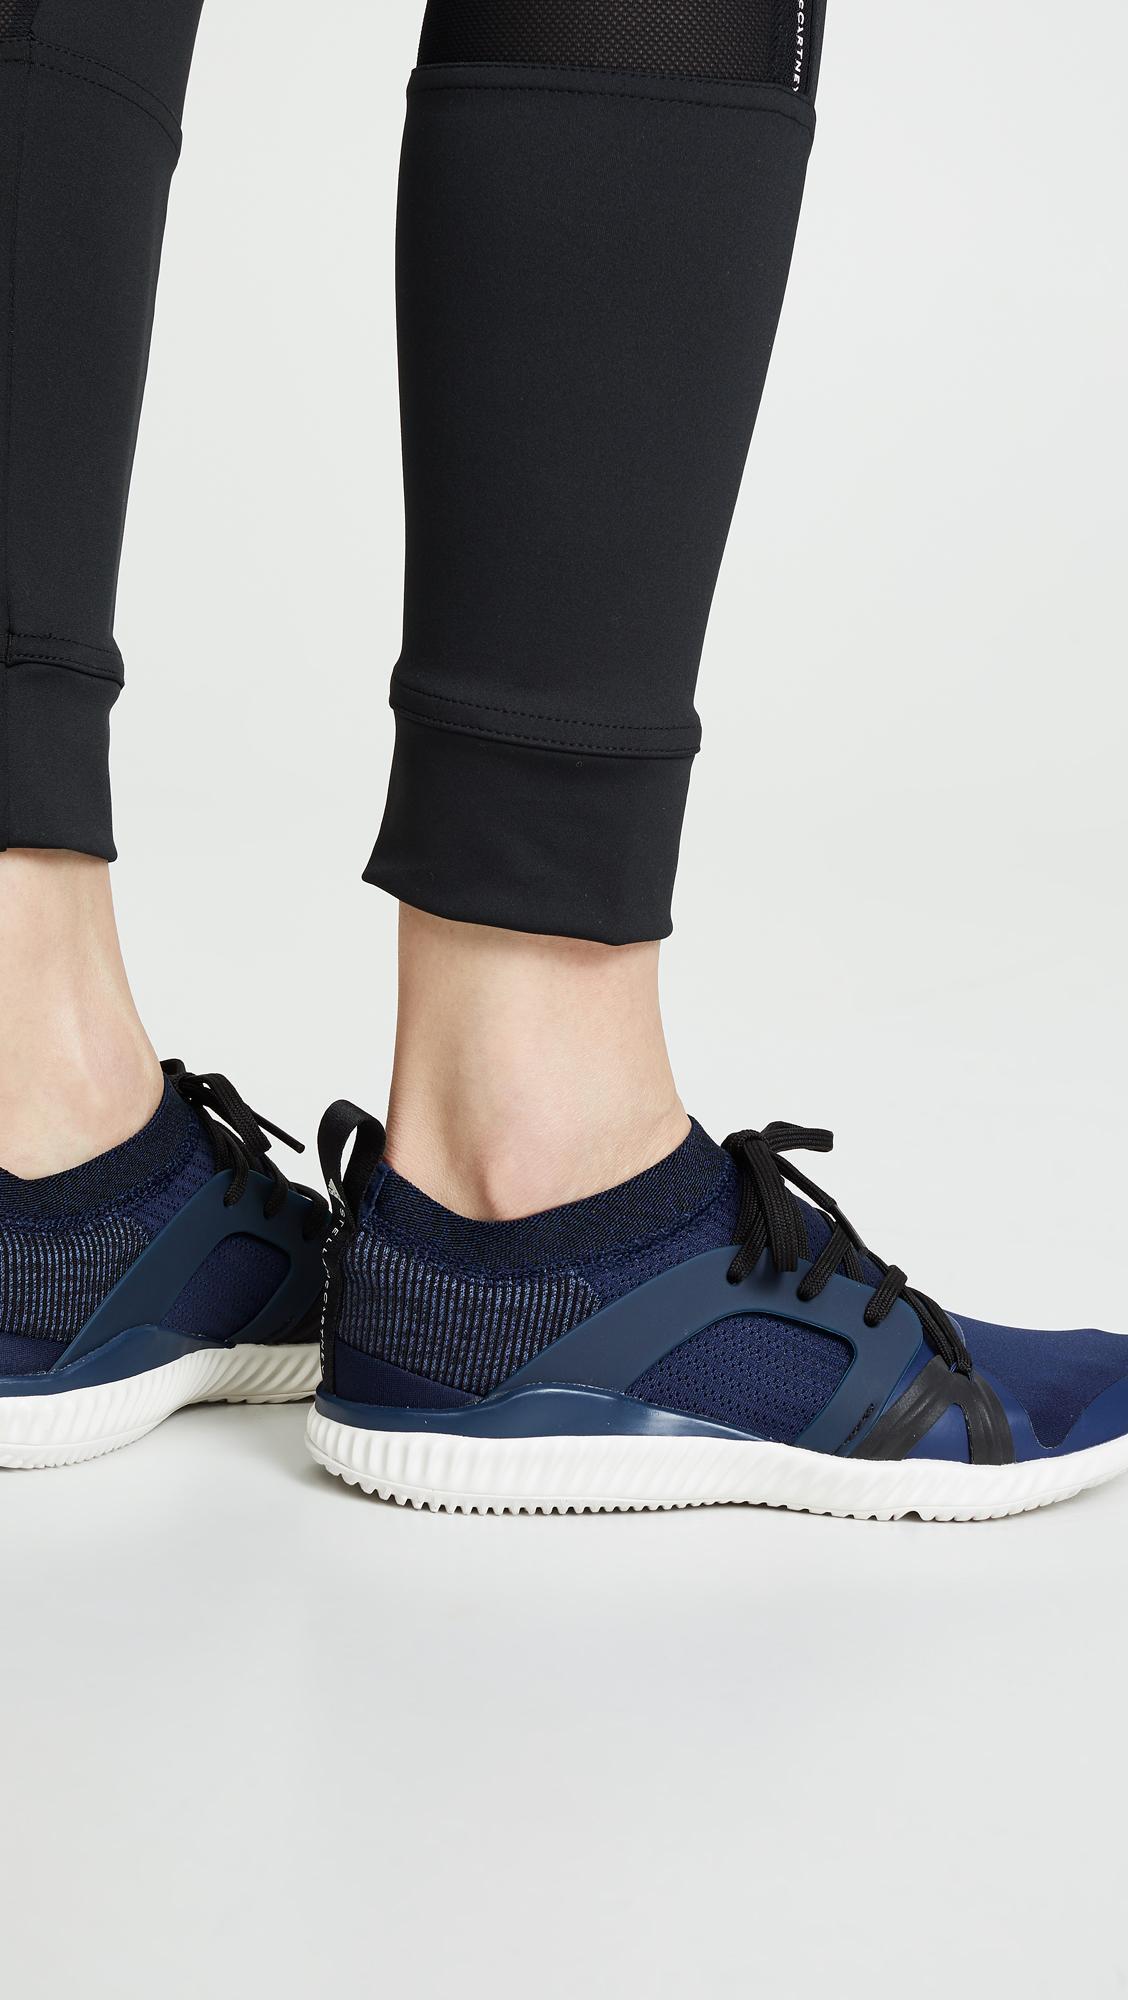 uk availability 347d4 69ab9 Adidas By Stella McCartney - Blue Crazytrain Pro Sneakers - Lyst. View  fullscreen